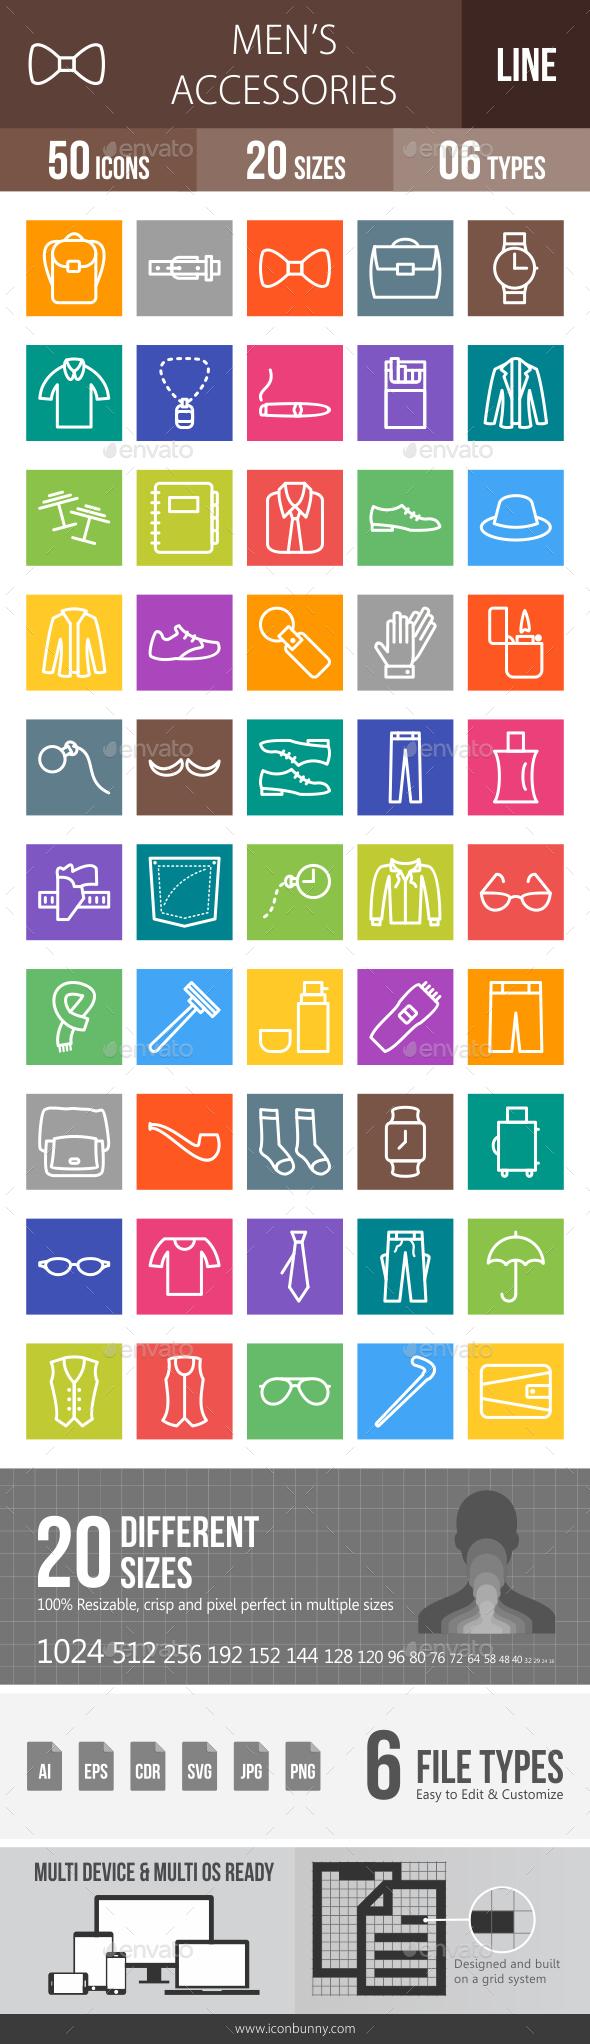 Men's Accessories Line Multicolor Icons - Icons